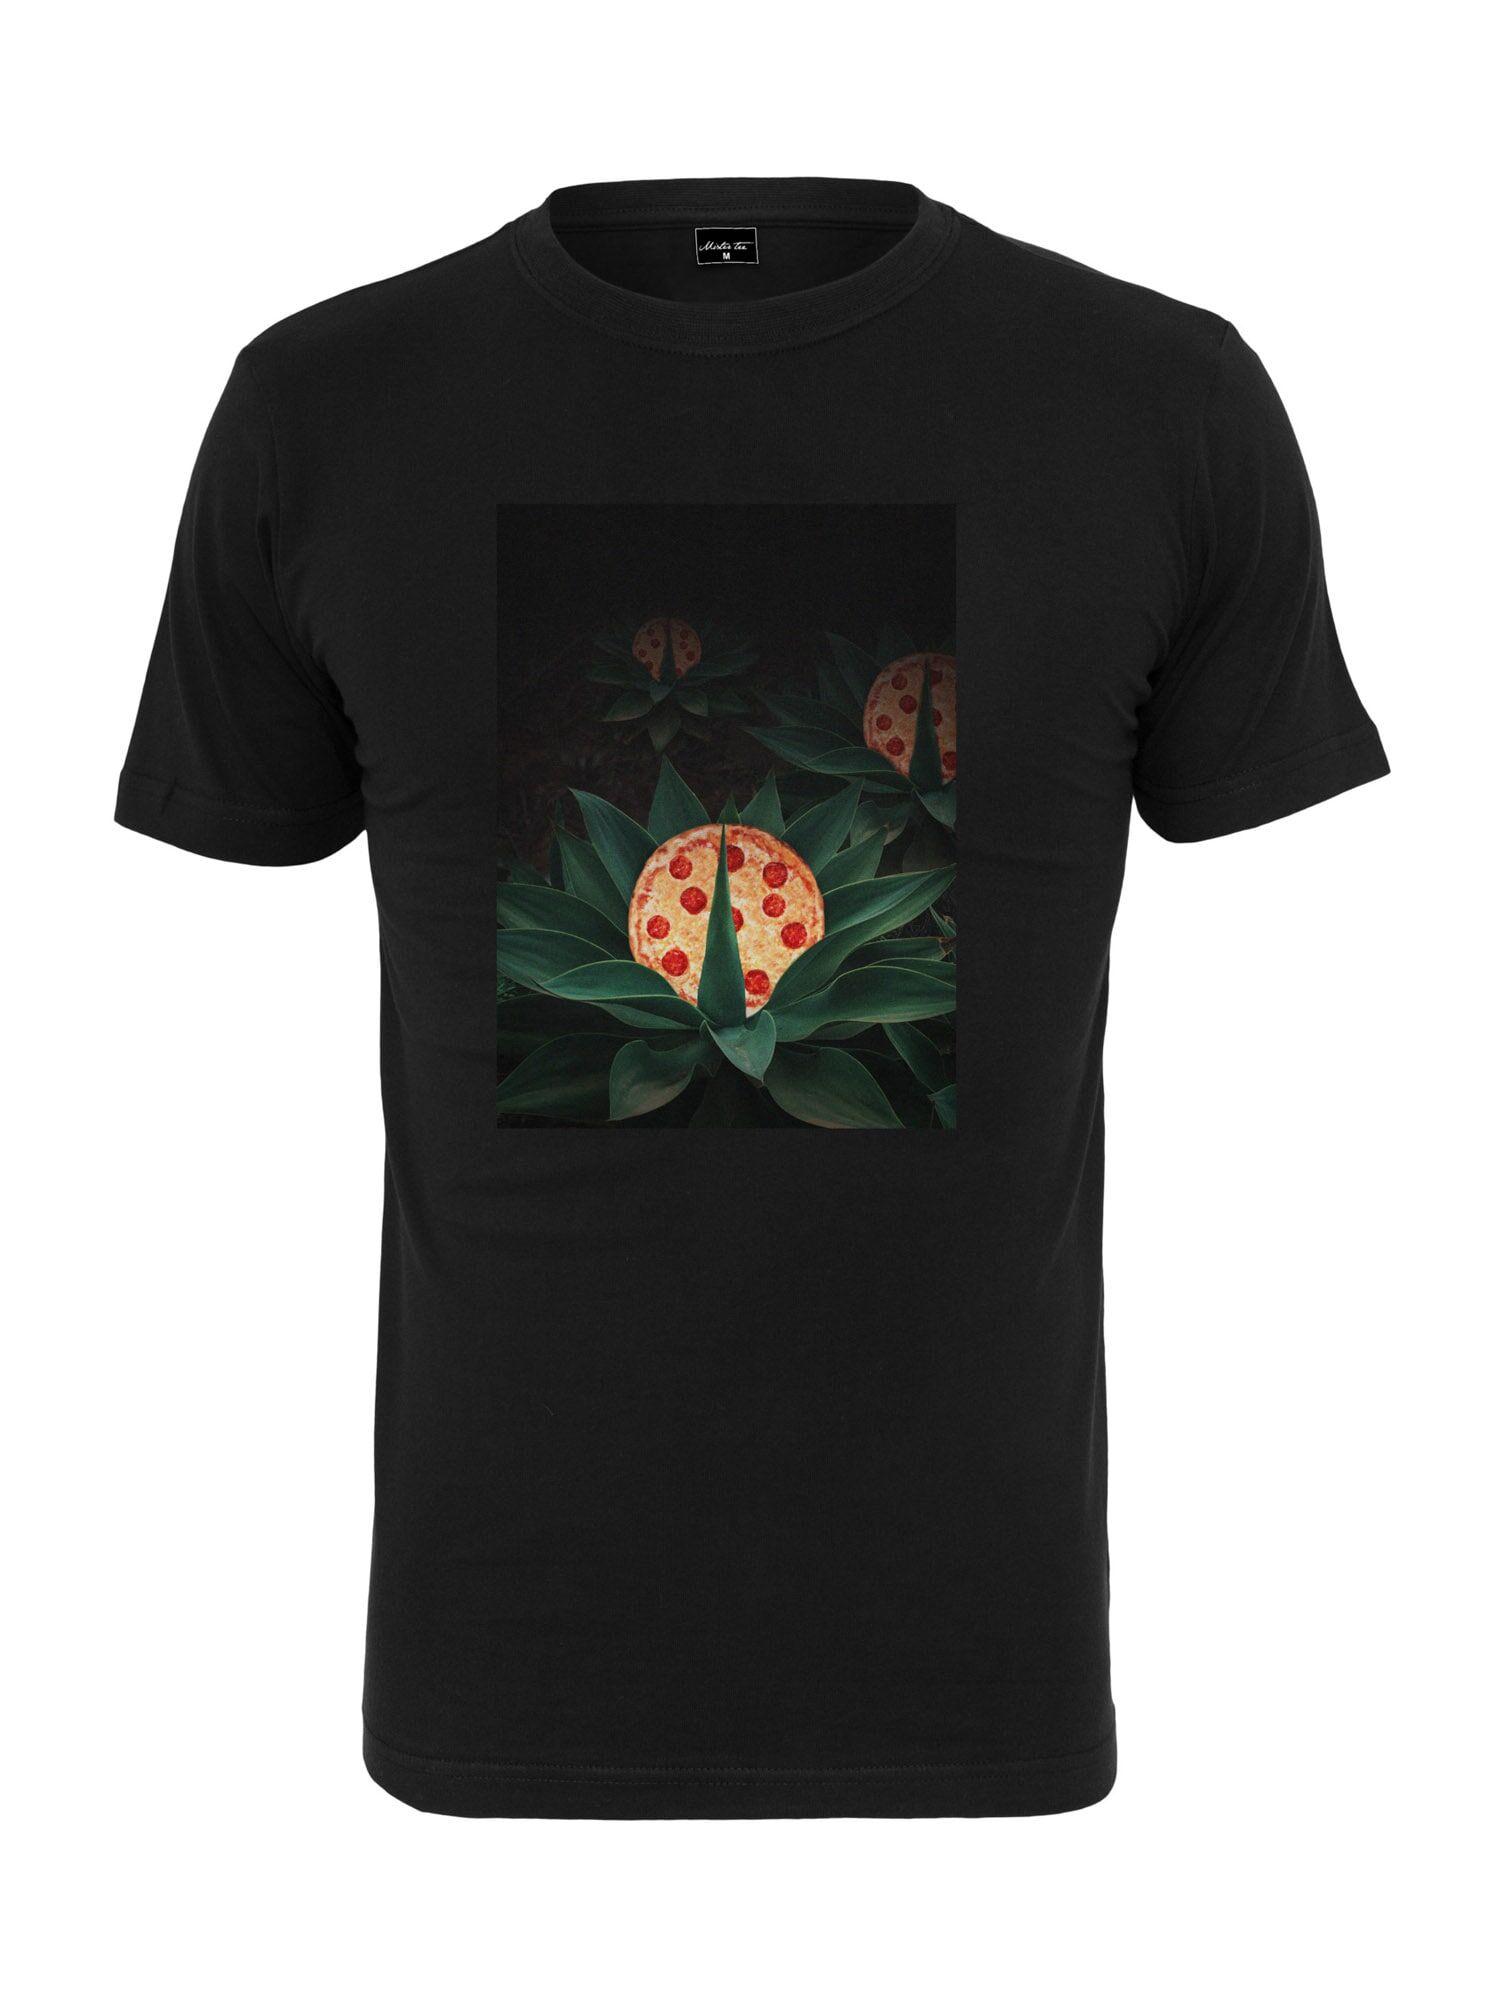 Tee T-Shirt 'Pizza Plant'  - Noir - Taille: M - male